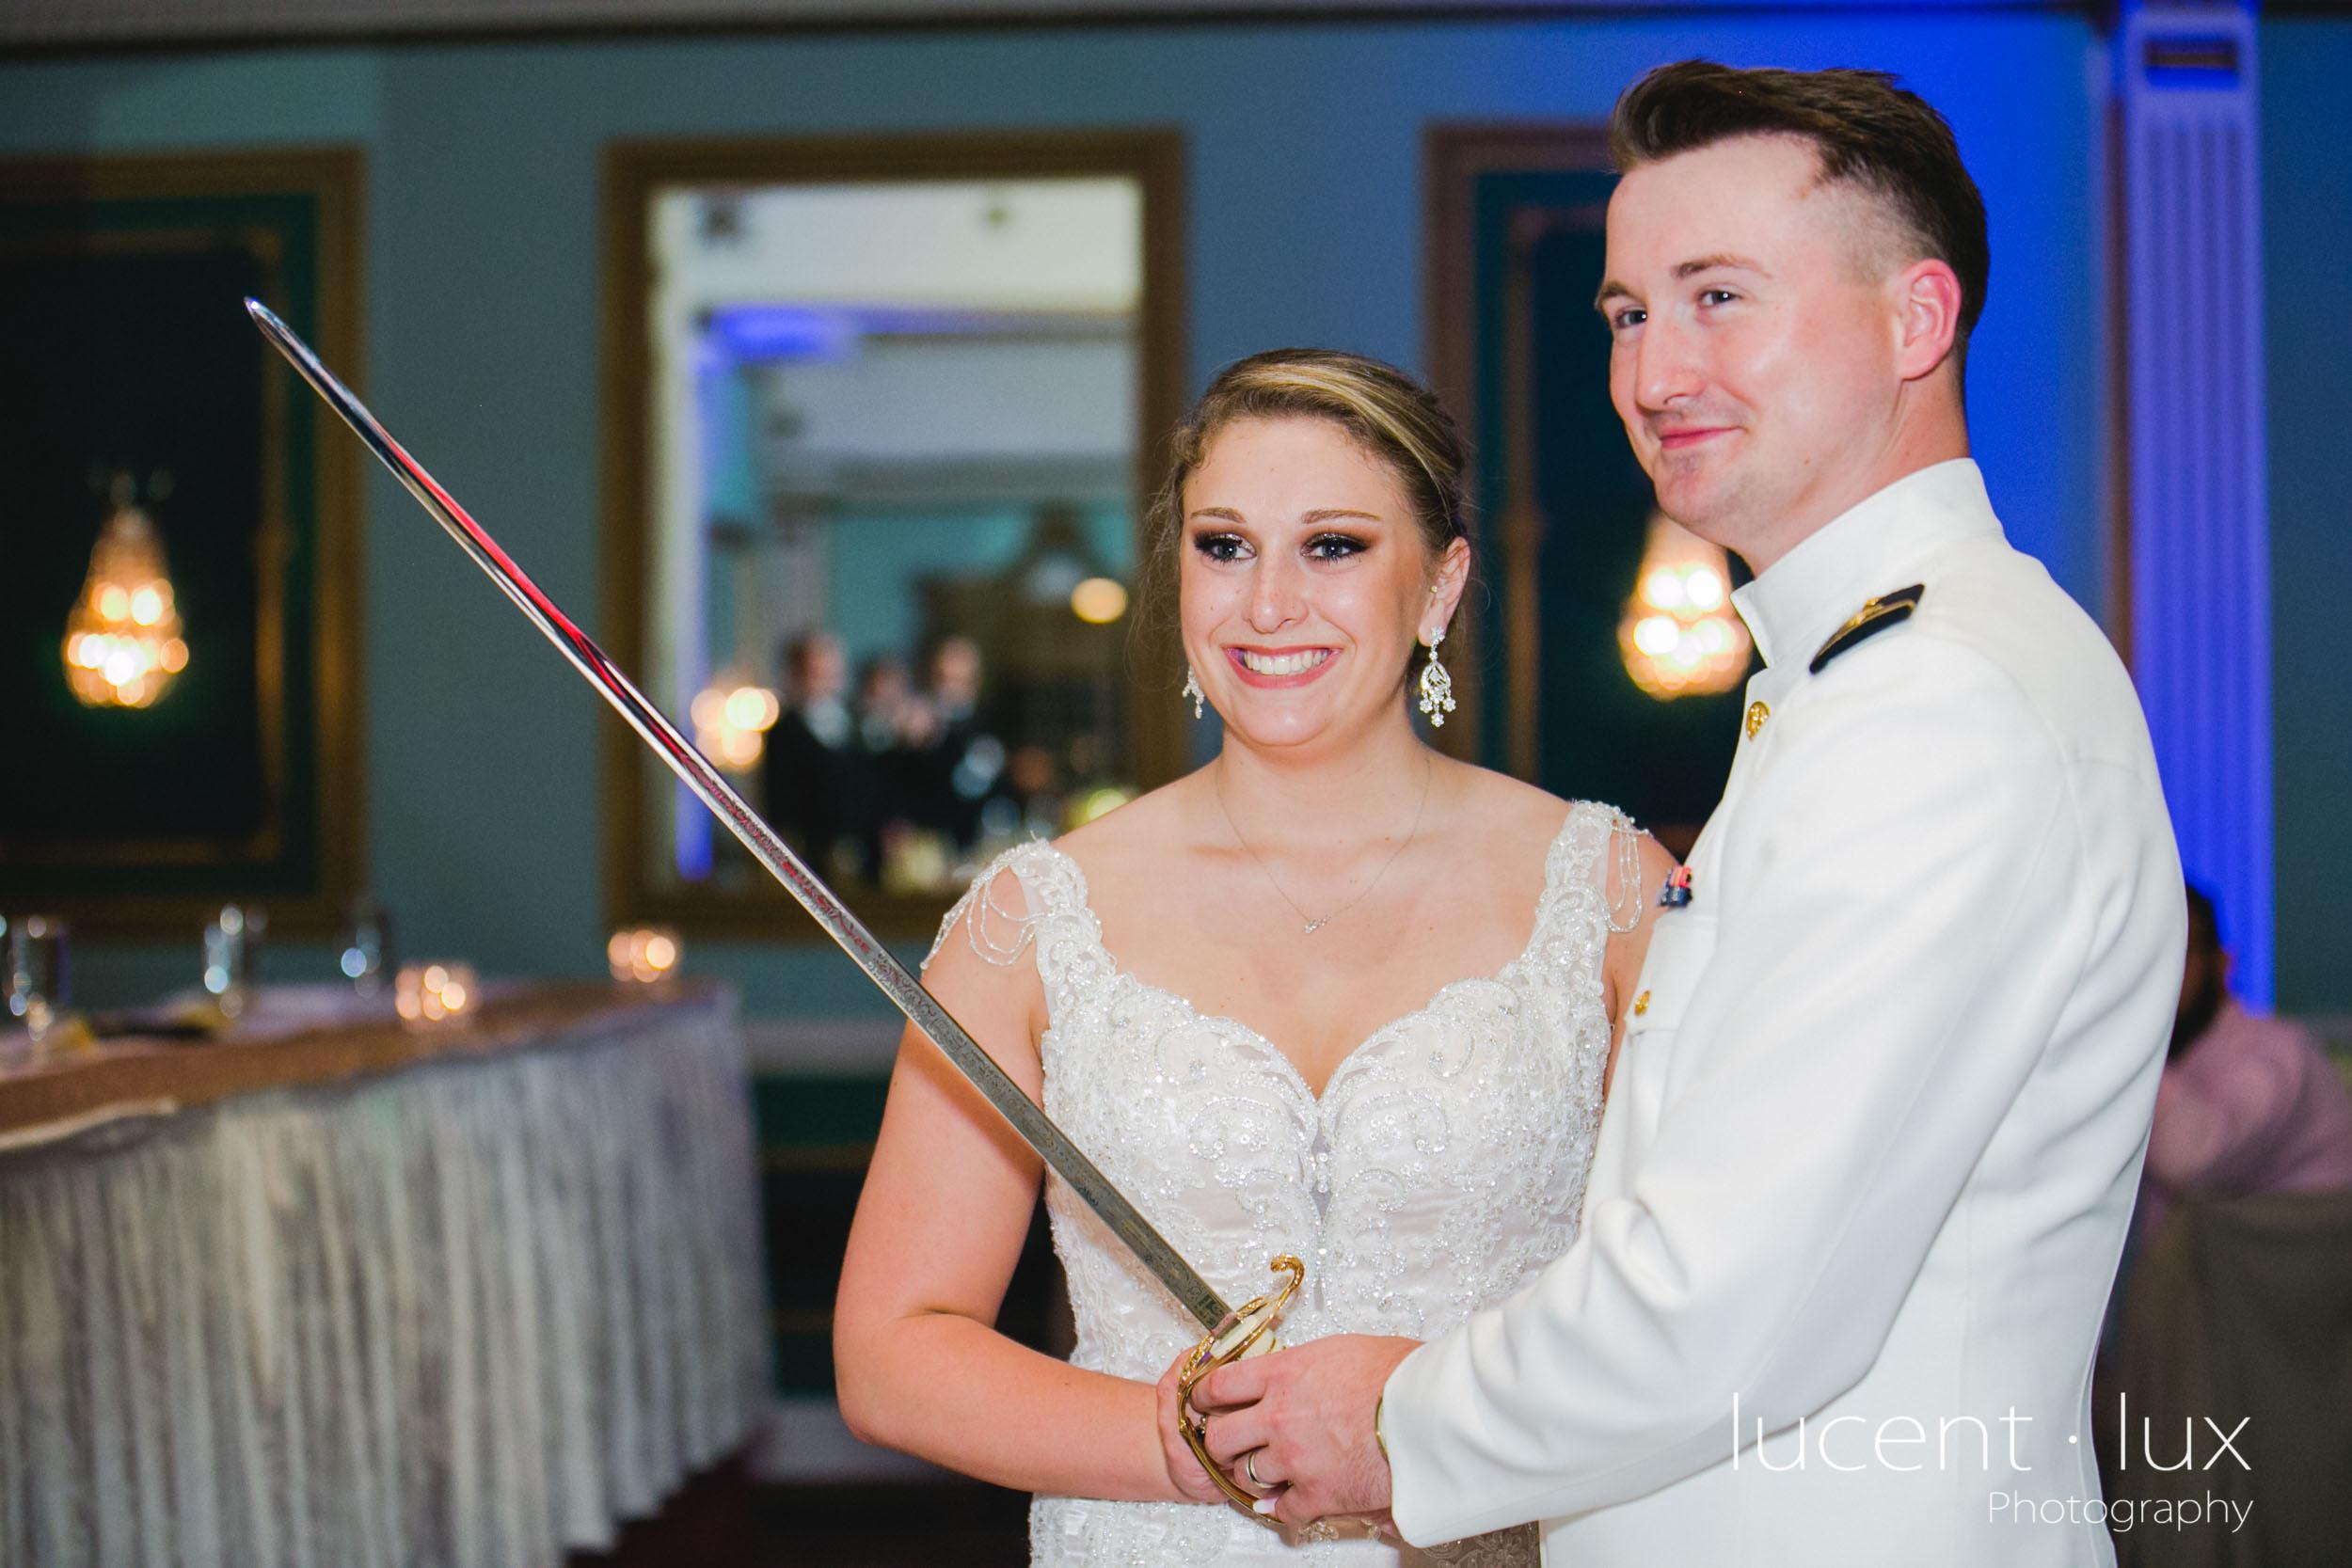 Wedding-Photography-Maryland-Pennsylvania-Photographer-Mendenhall-Inn-Media-Portrait-Event-301.jpg